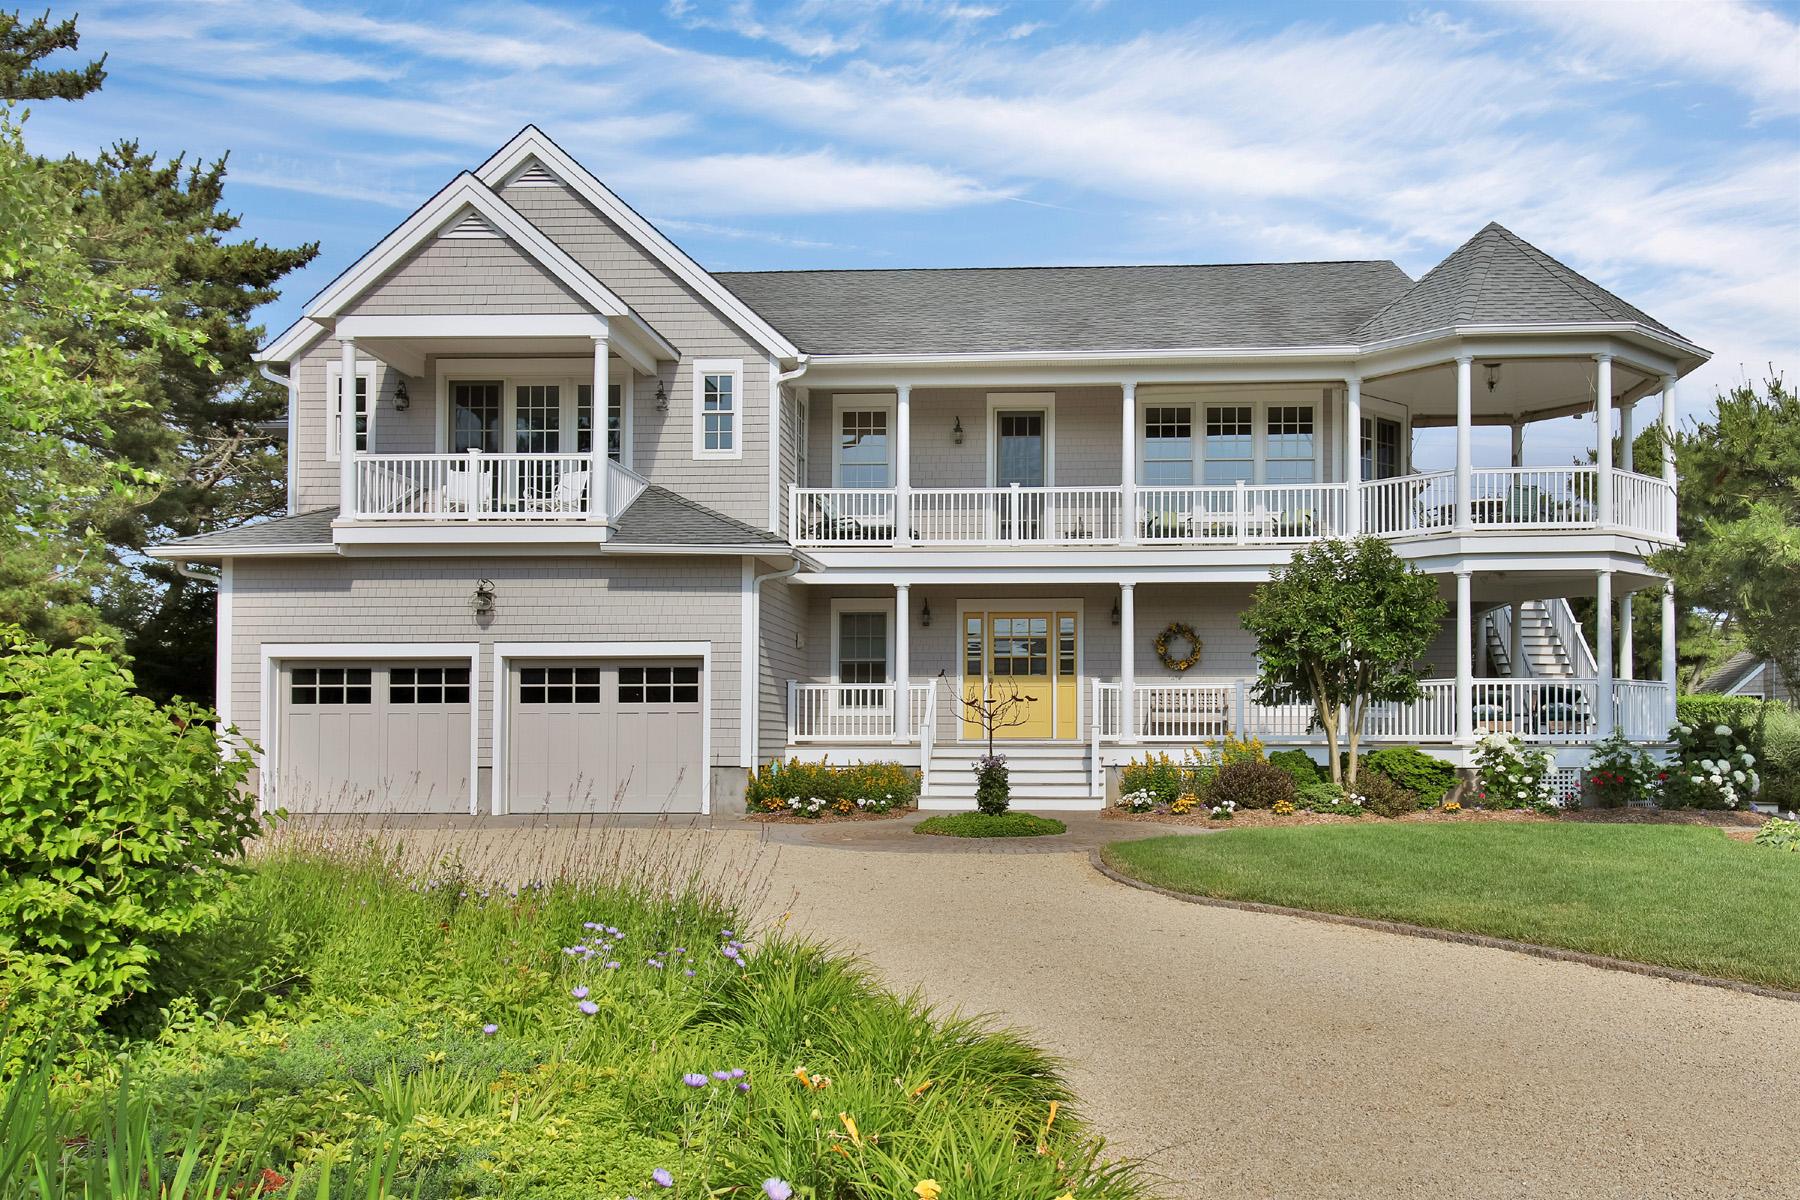 獨棟家庭住宅 為 出售 在 Custom Nantucket Style Shore Colonial 1513 Runyon Lane Mantoloking, 新澤西州, 08738 美國